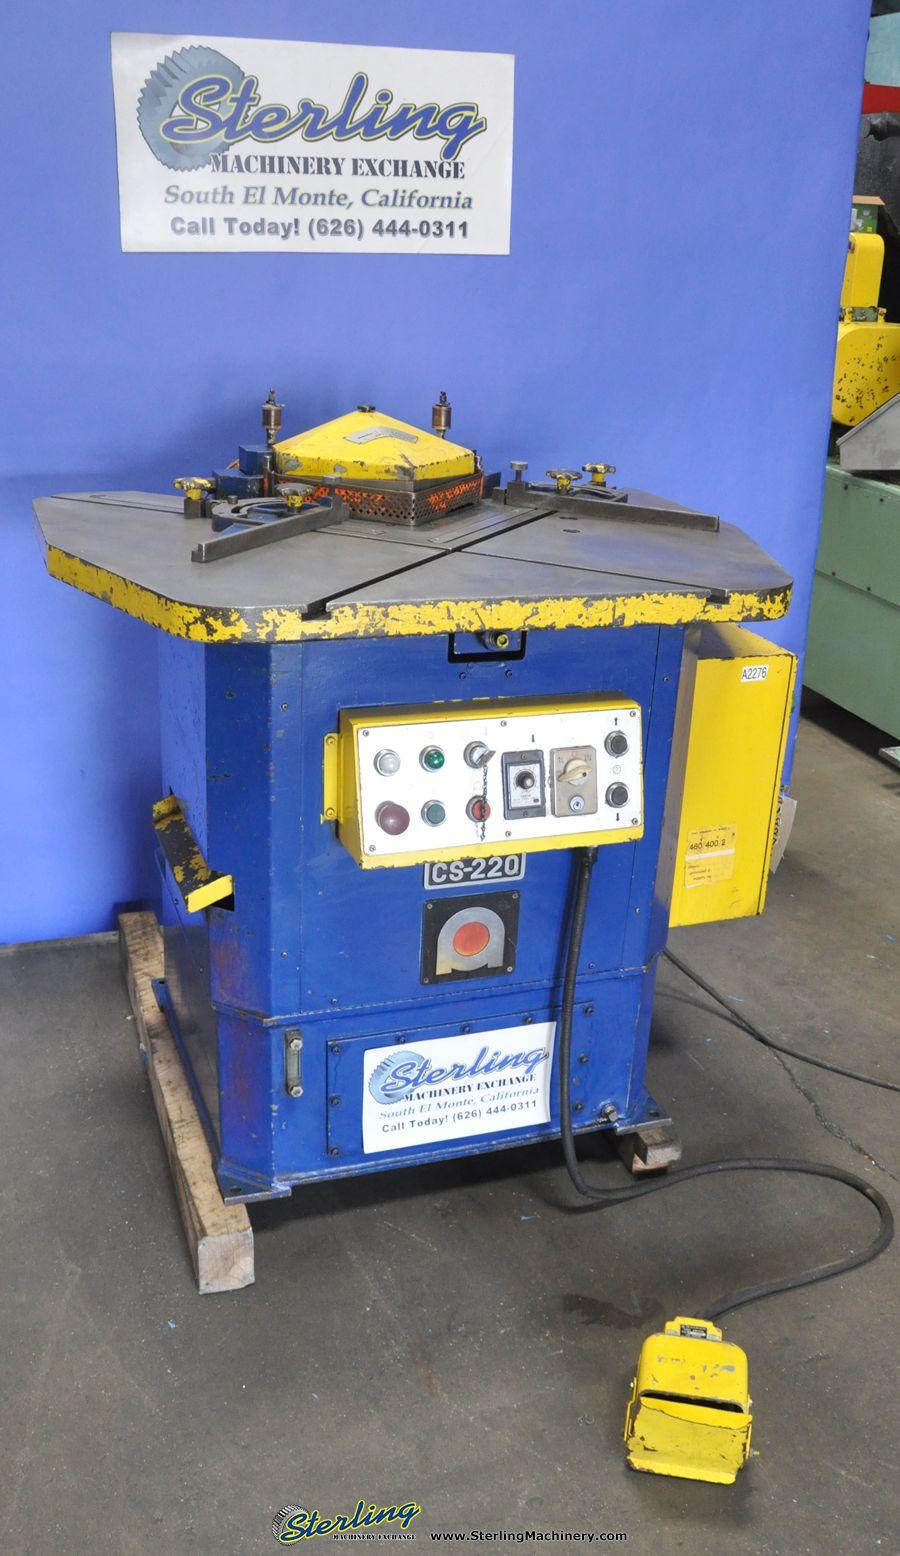 1 8 X 8 5 8 X 8 5 8 Used Amada Power Notcher Mdl Cs 220 Twin Work Guides Timer Foot Pedal A2276 Hydraulic Press Brake Milling Machine Metal Working